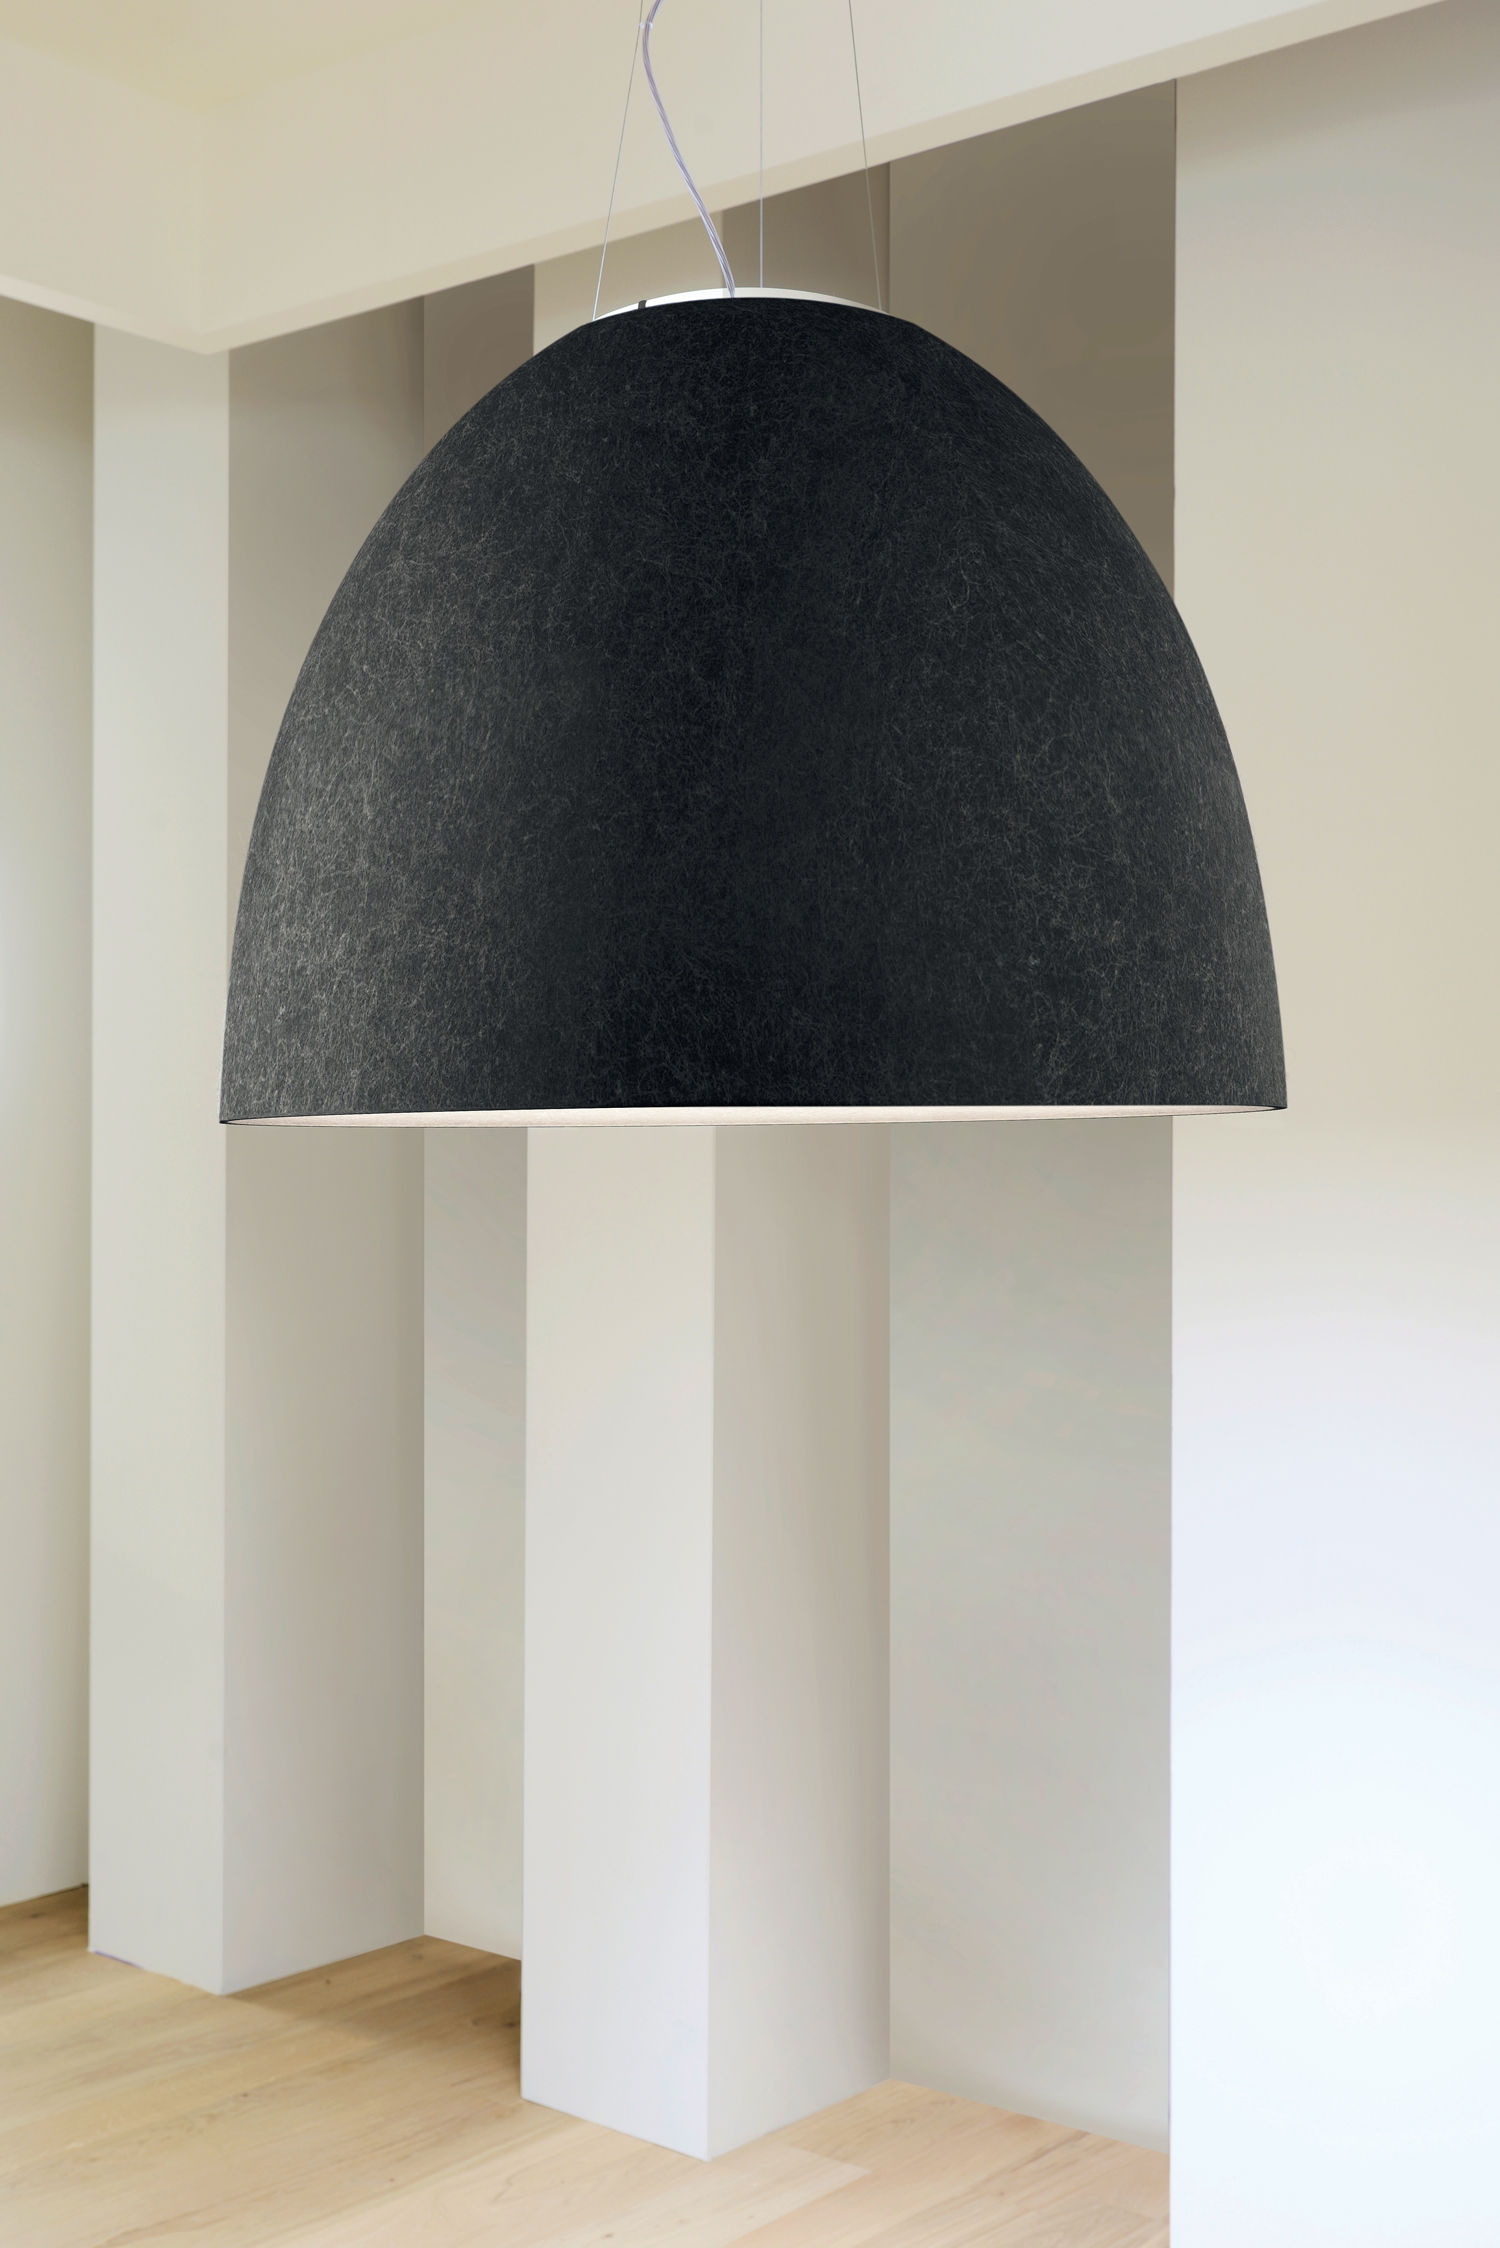 Nur Led Suspension Acoustique Felt 91 Cm Dark Grey By Artemide